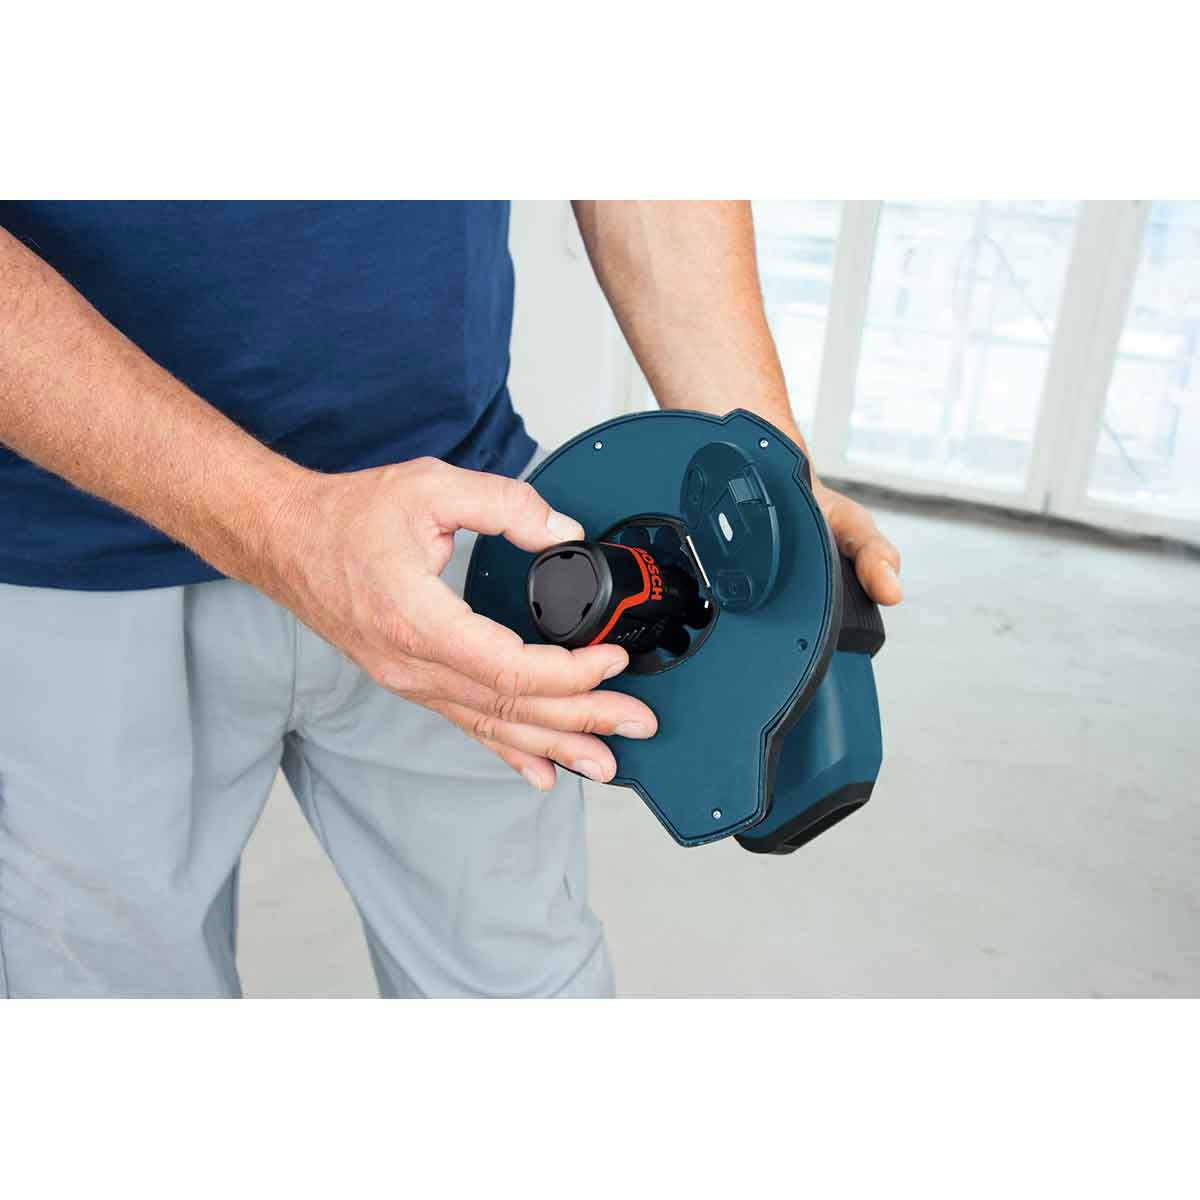 bosch dlr130 distance measurer manual